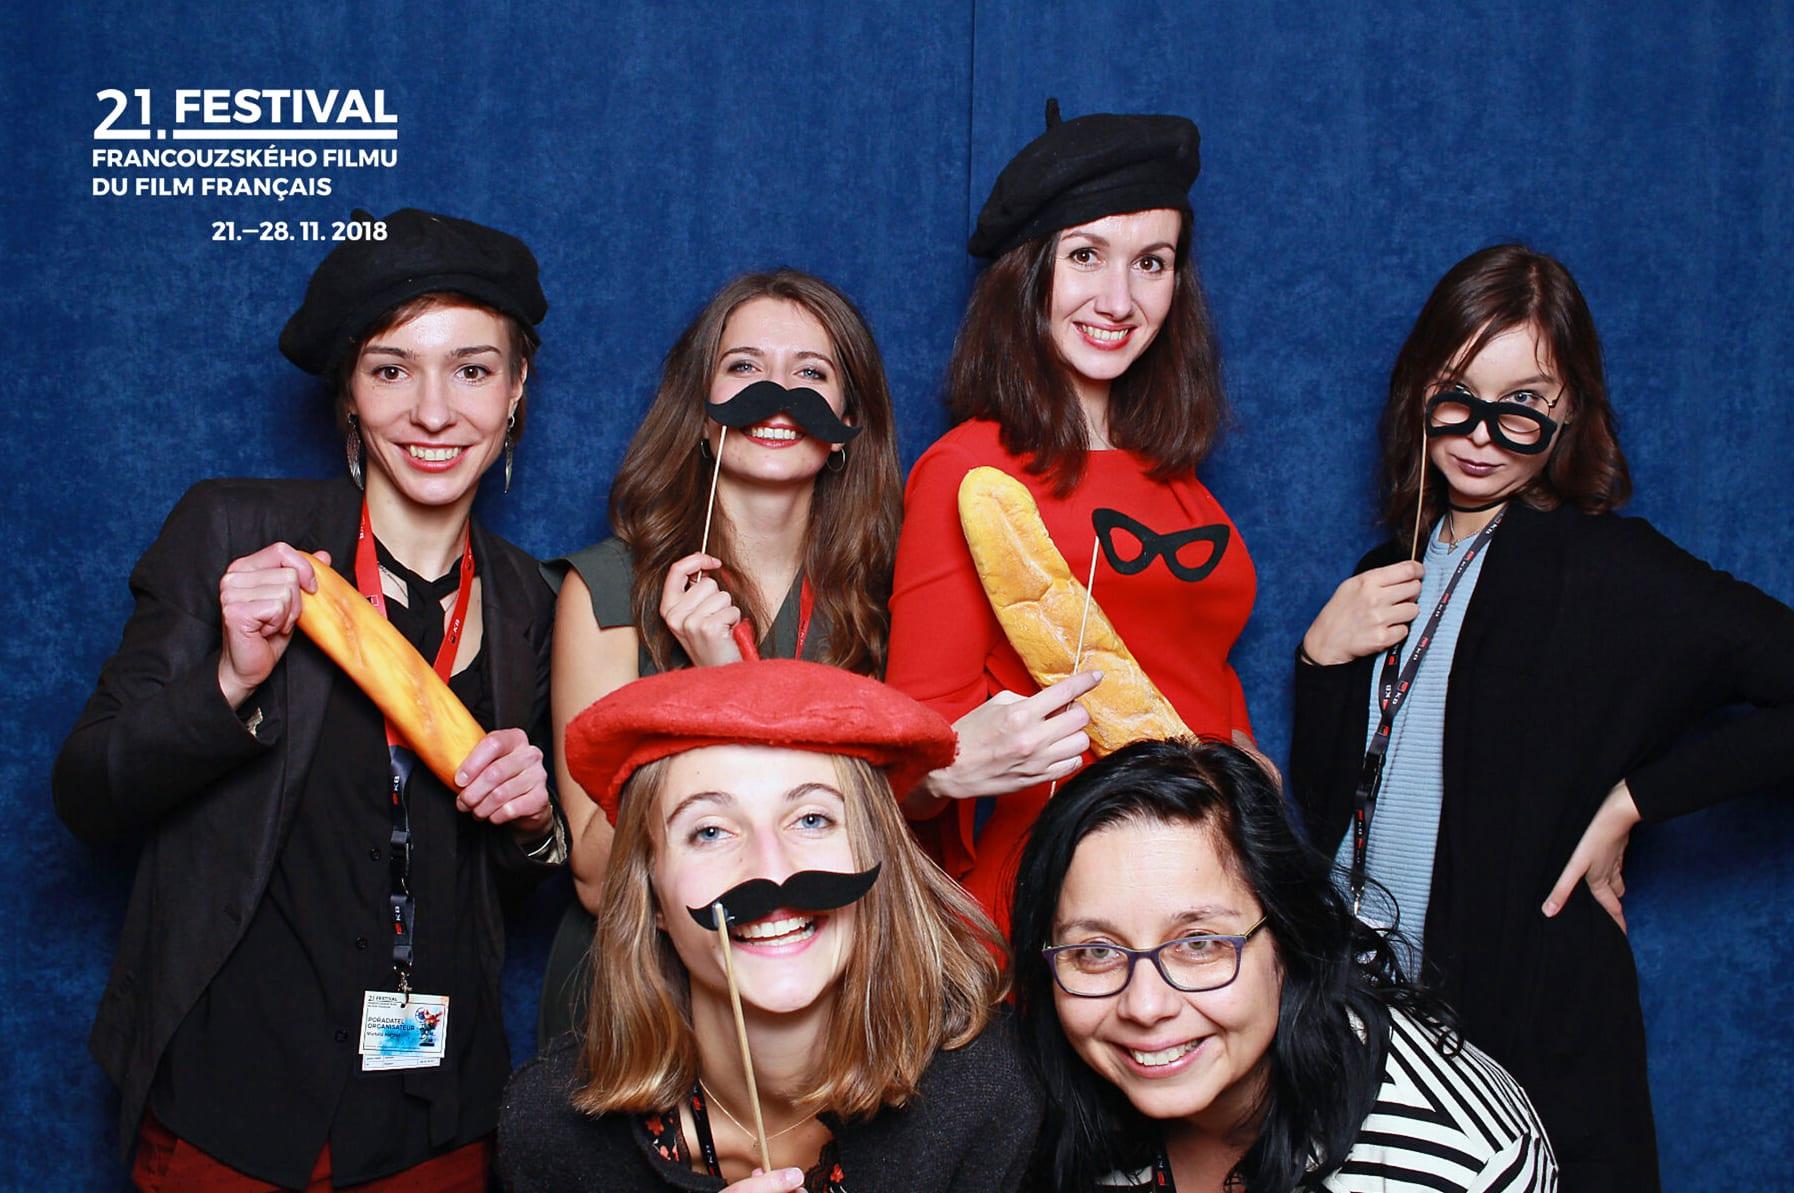 fotokoutek-21-festival-francouzskeho-filmu-21-11-2018-523885